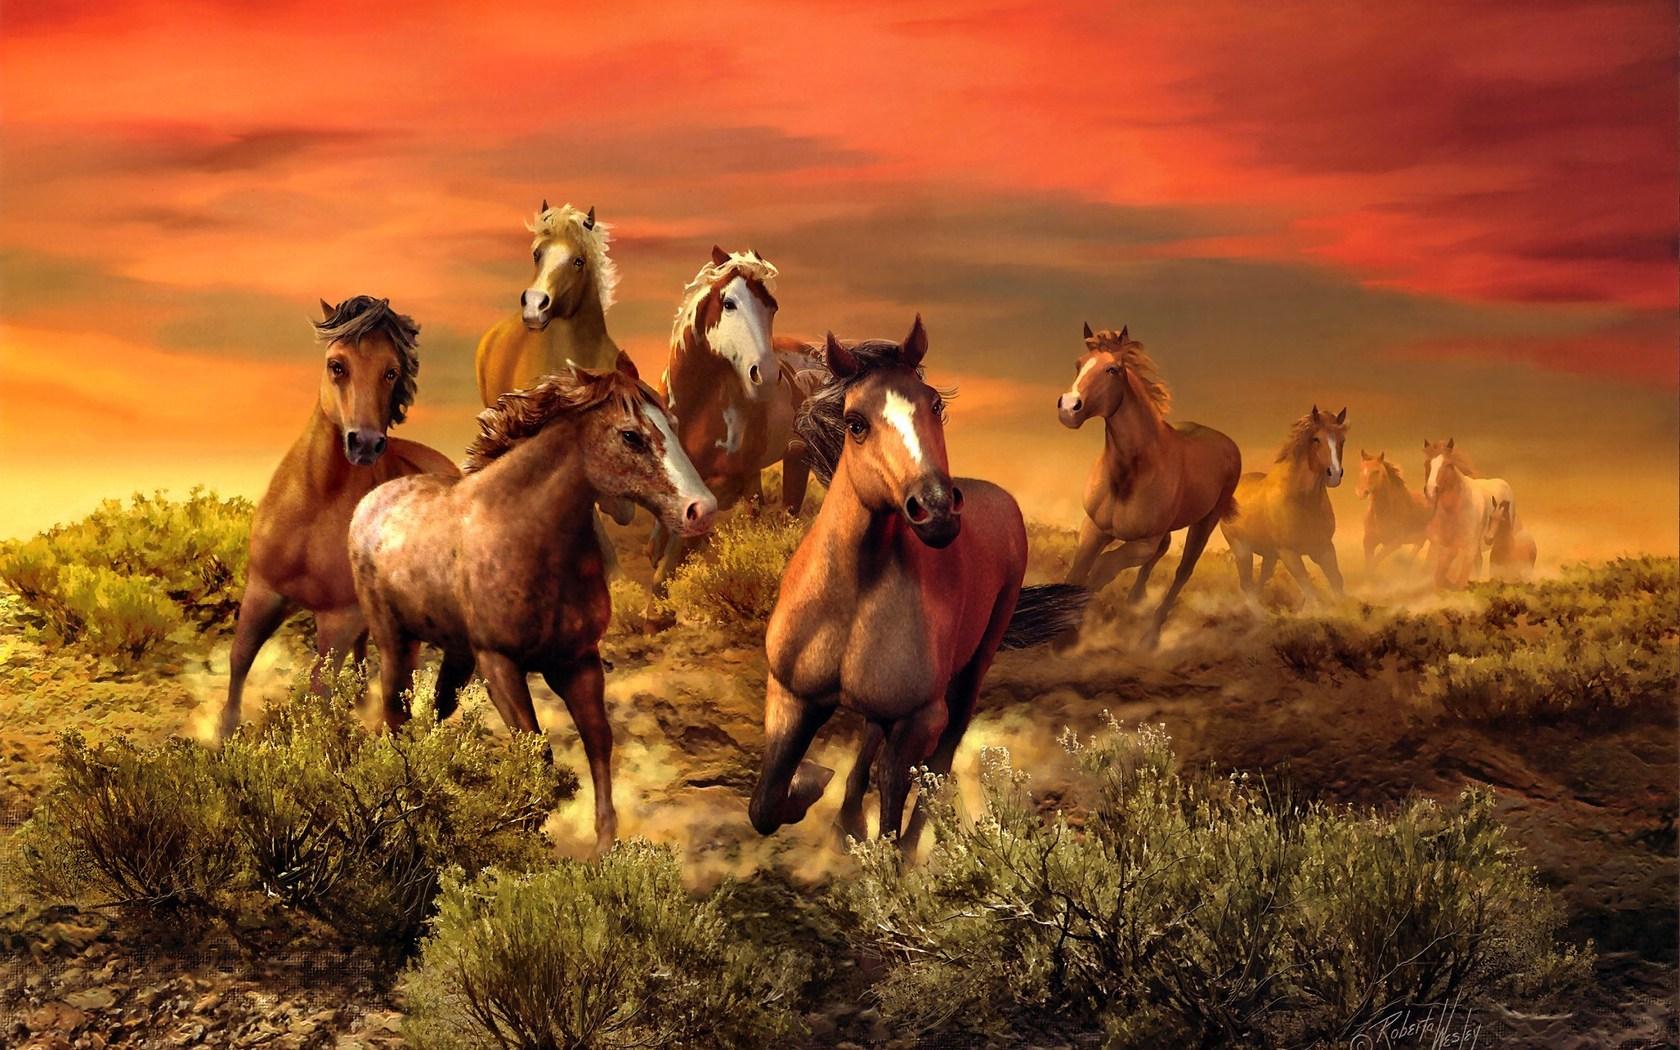 Free horse wallpaper wallpapersafari painting horses hd wallpaper 2013 hd wallpaper 1680x1050 altavistaventures Image collections